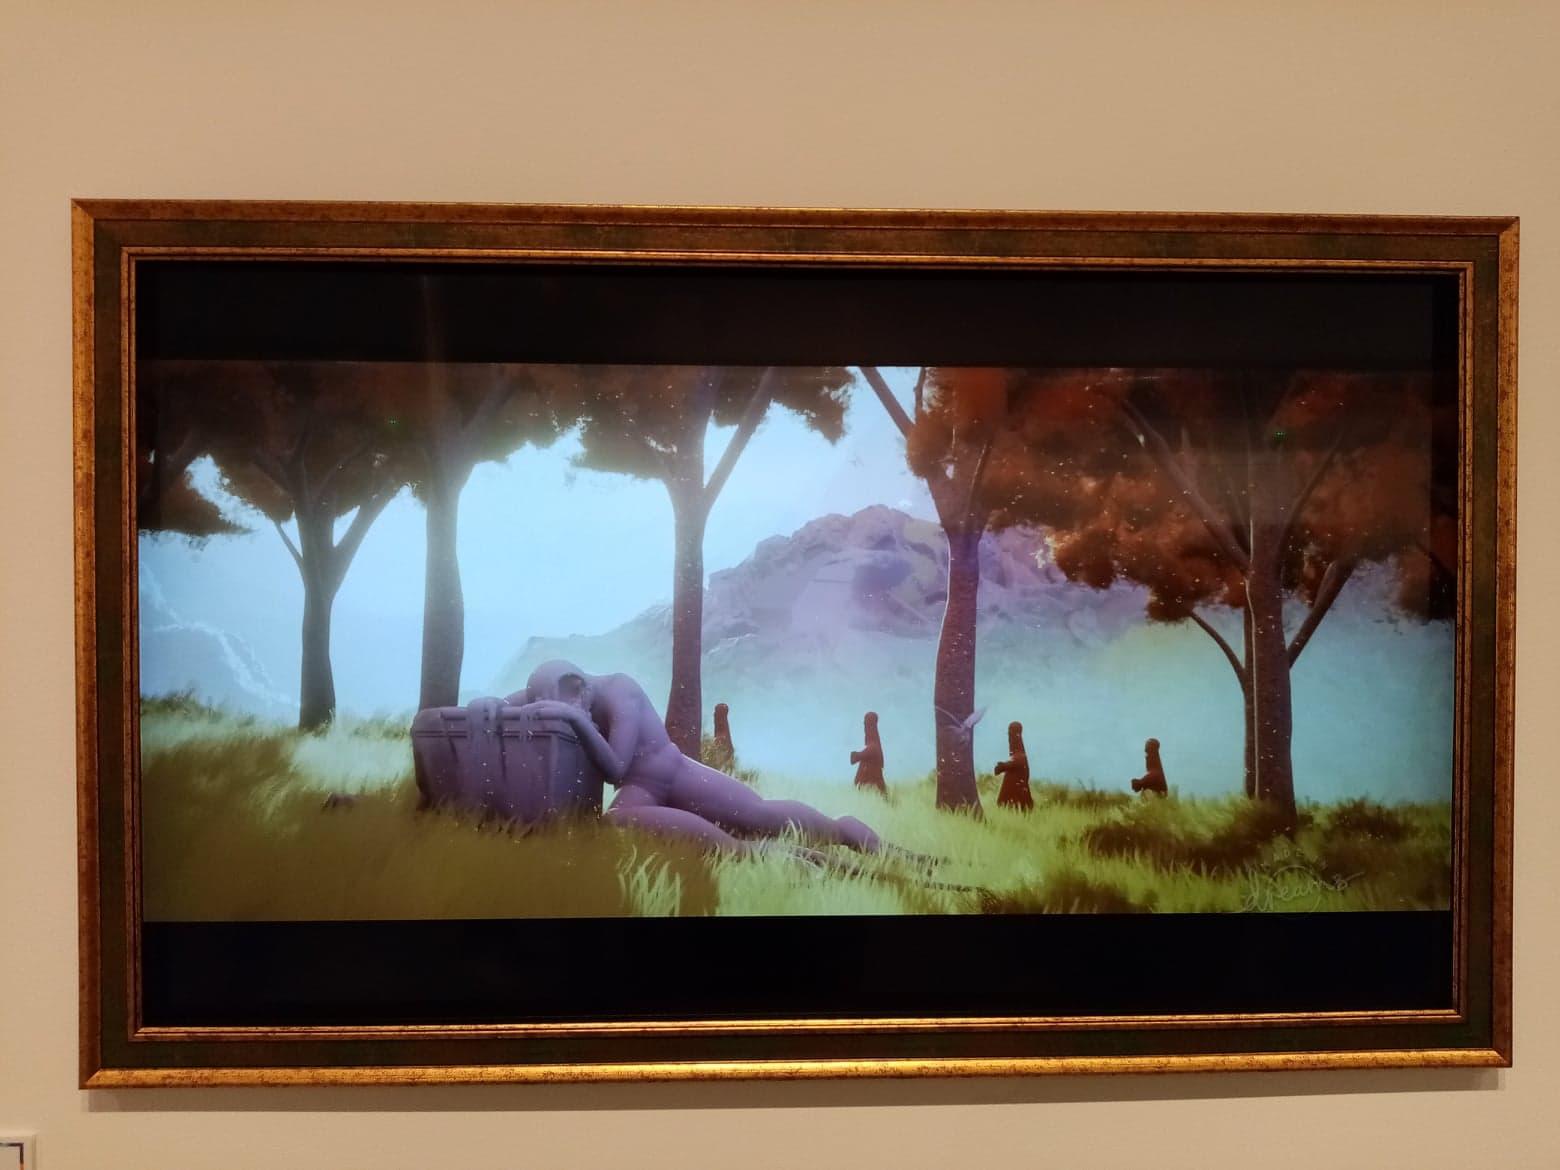 Galerie Dreams